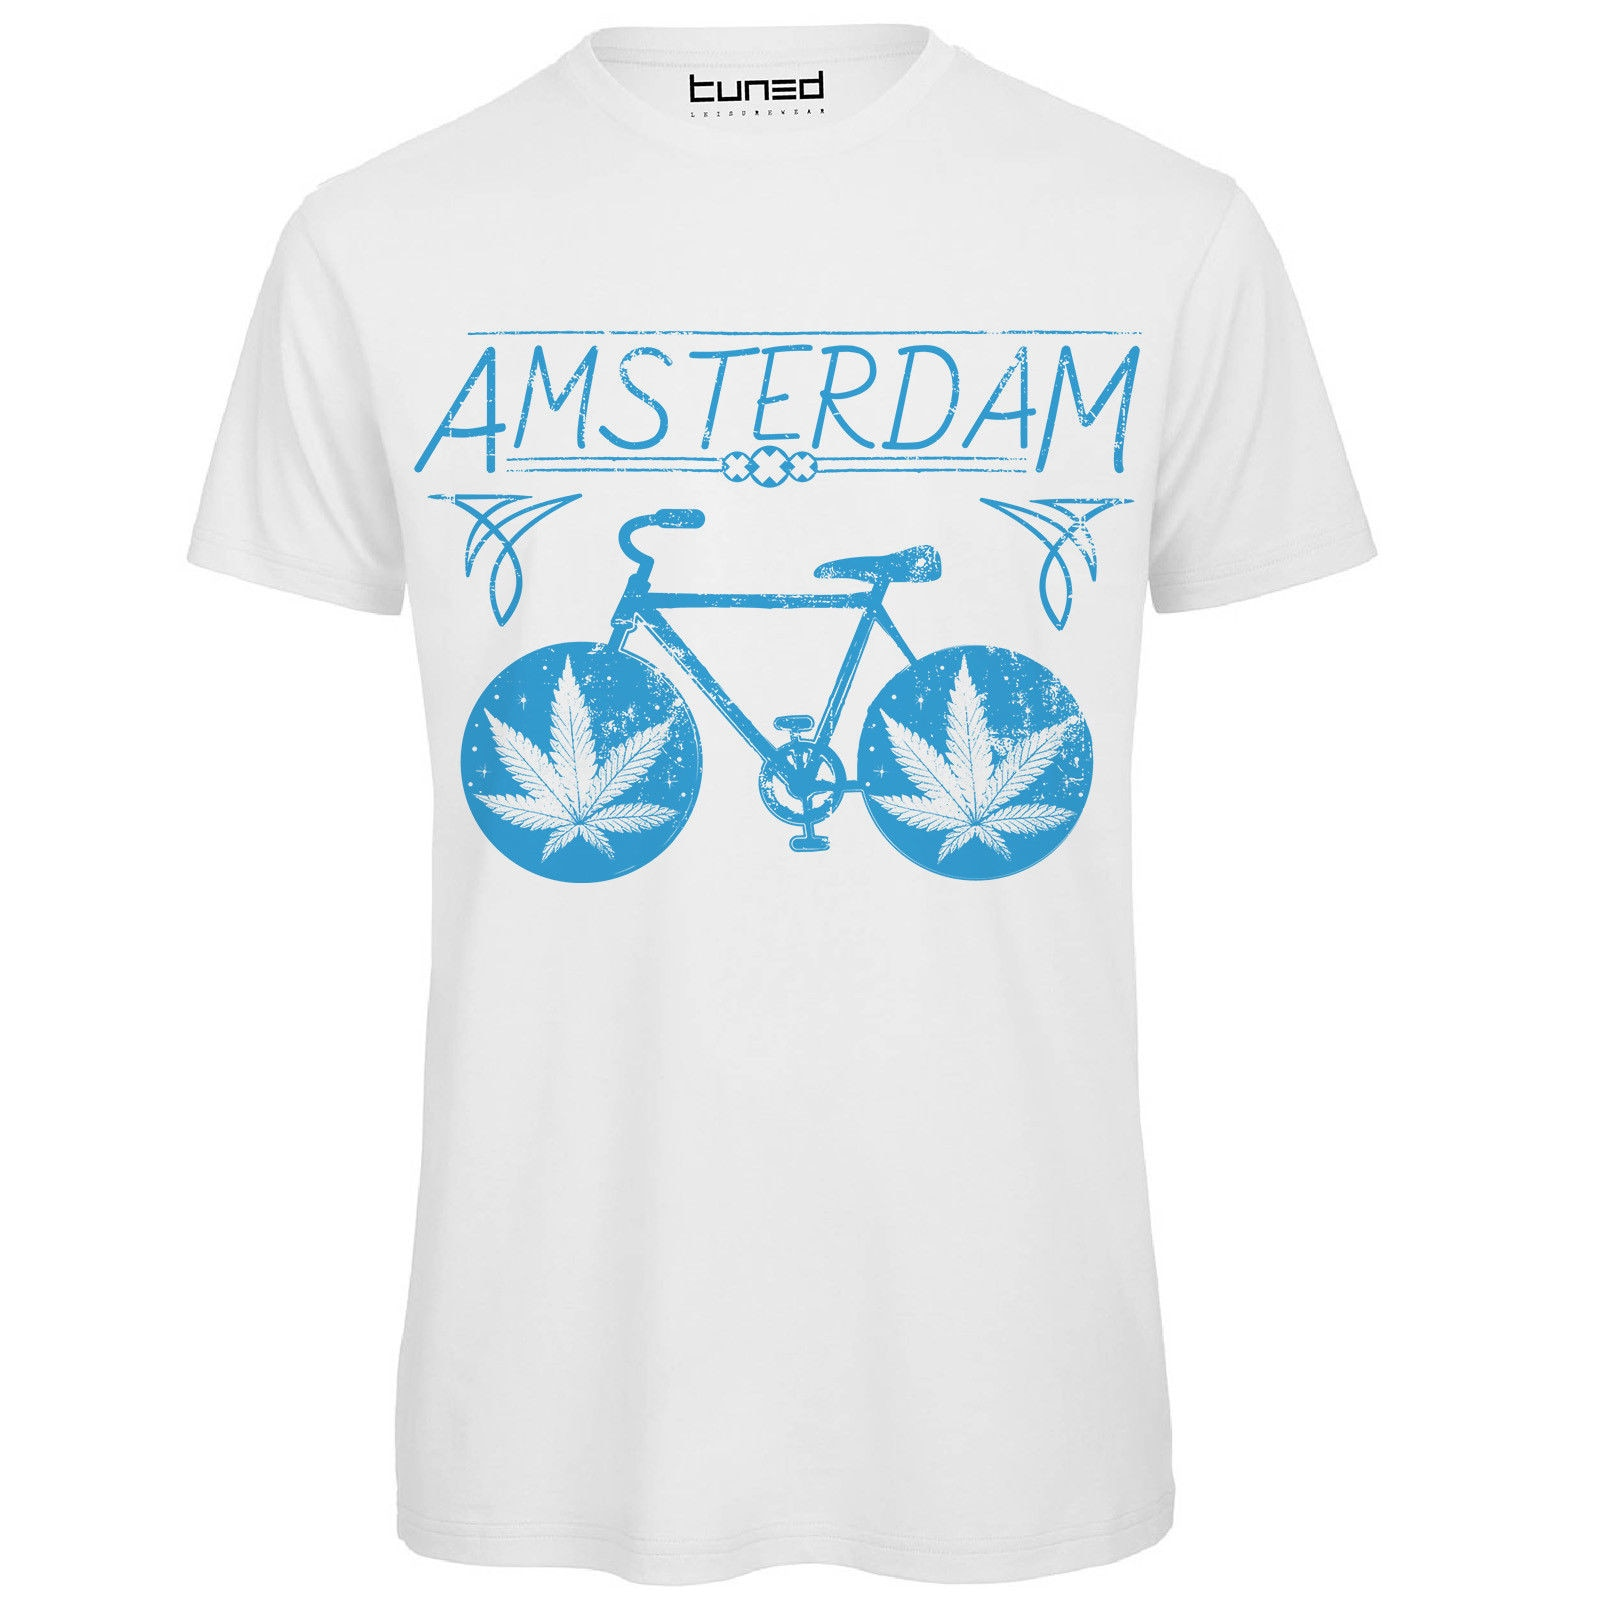 Camiseta divertida Uomo Maglietta Con estampa irónica Bicicletta Amsterdam hombres Tuned camiseta...